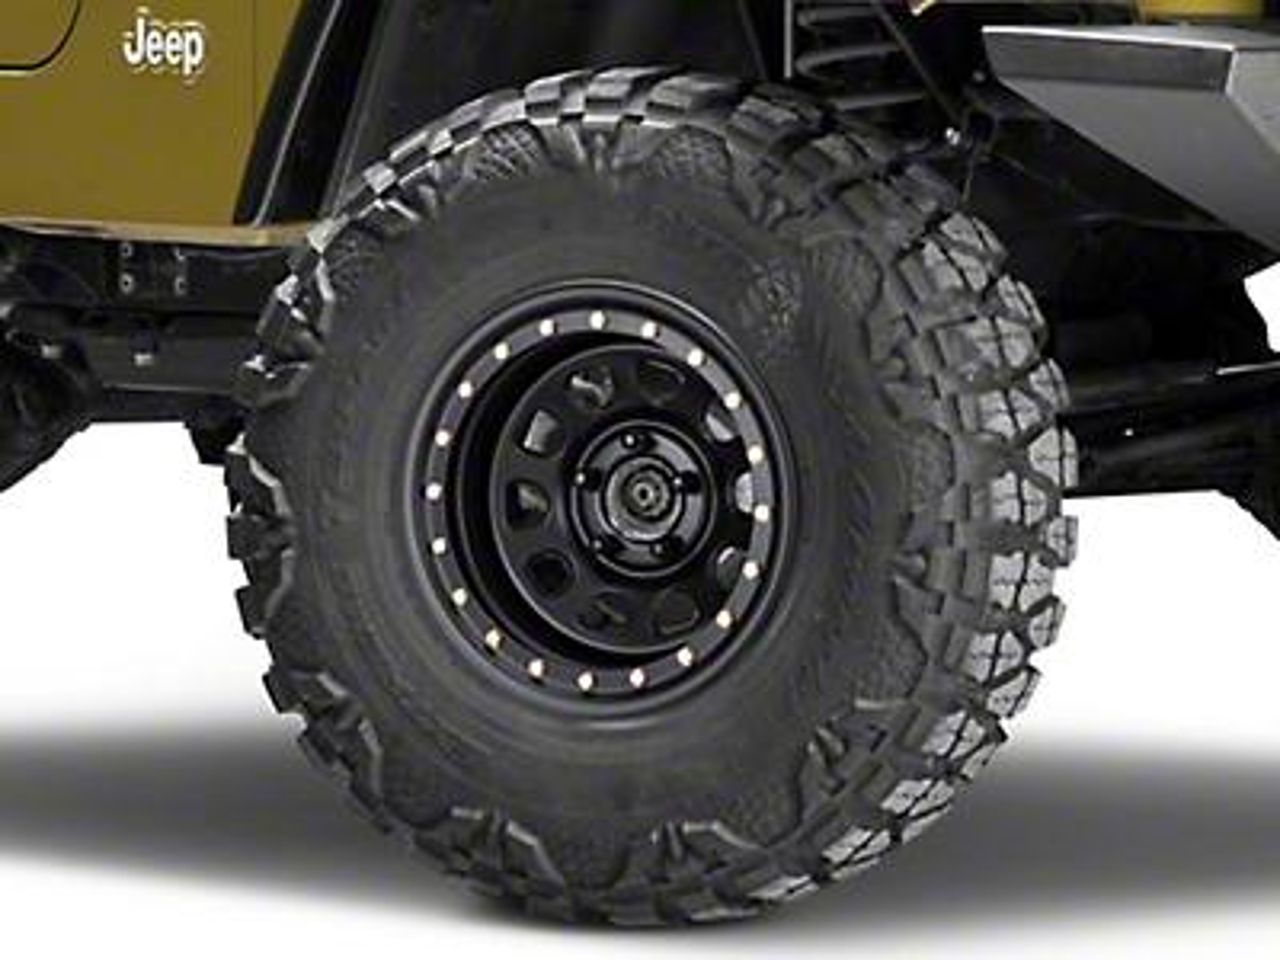 Pro Comp Steel Series 252 Street Lock Flat Black Wheel - 15x8 (87-06 Wrangler YJ & TJ)